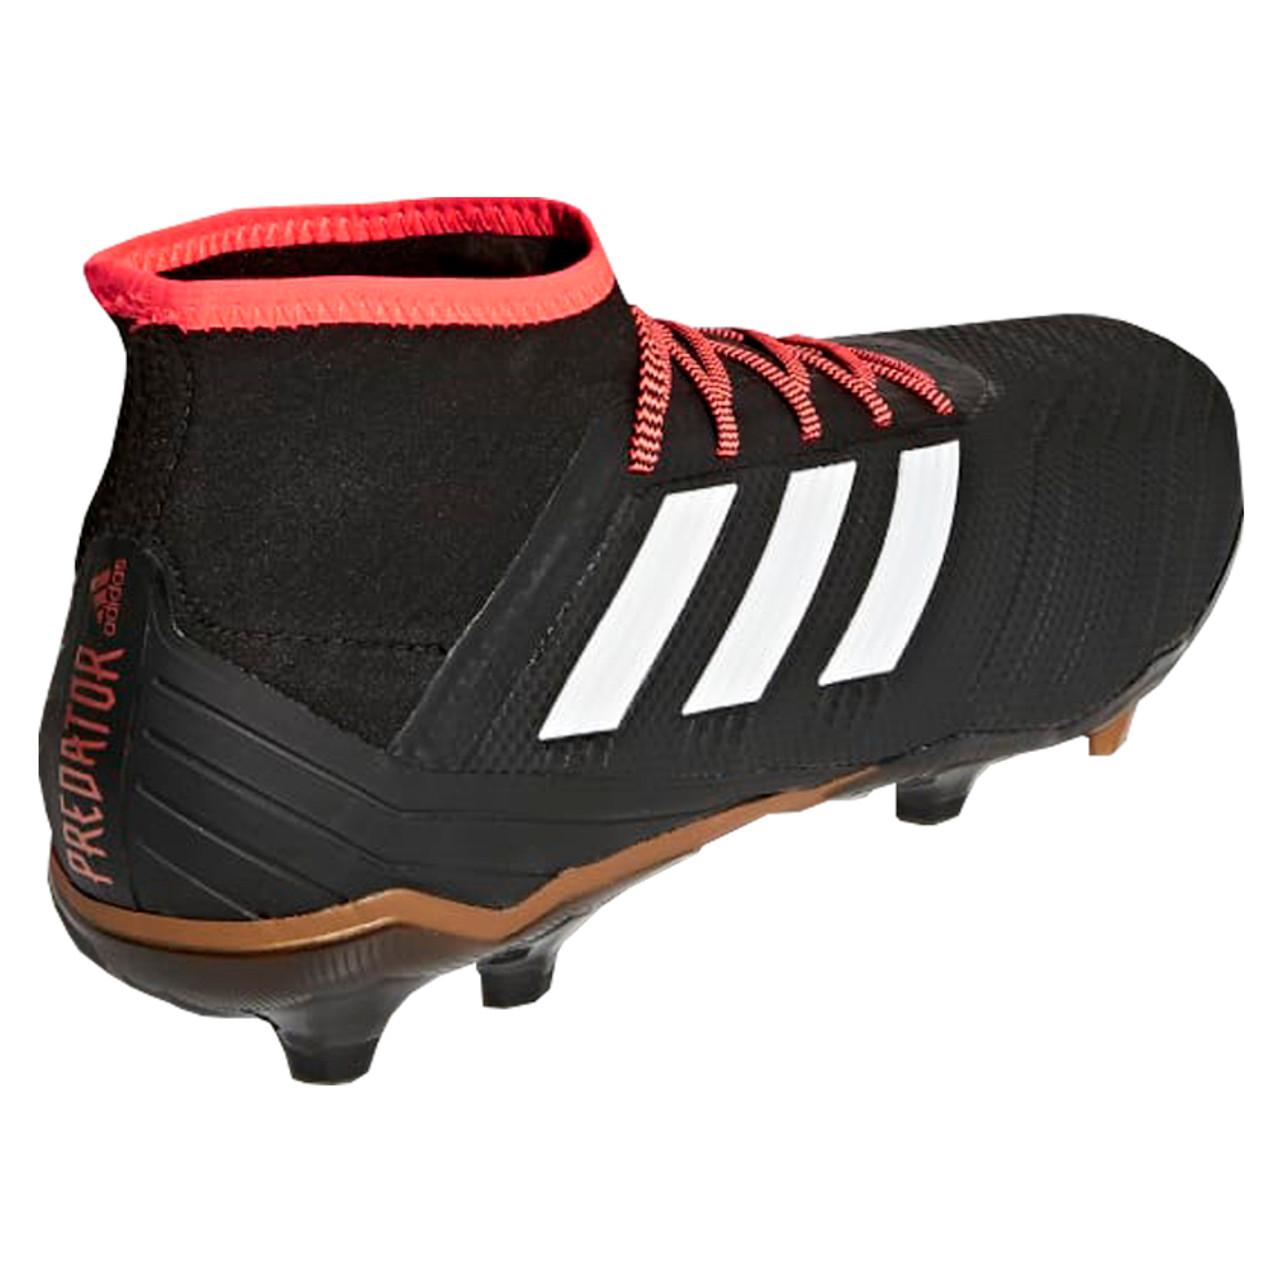 25dc55edd12 Adidas Predator 18.2 FG Men s Soccer Cleats CP9290 - Black